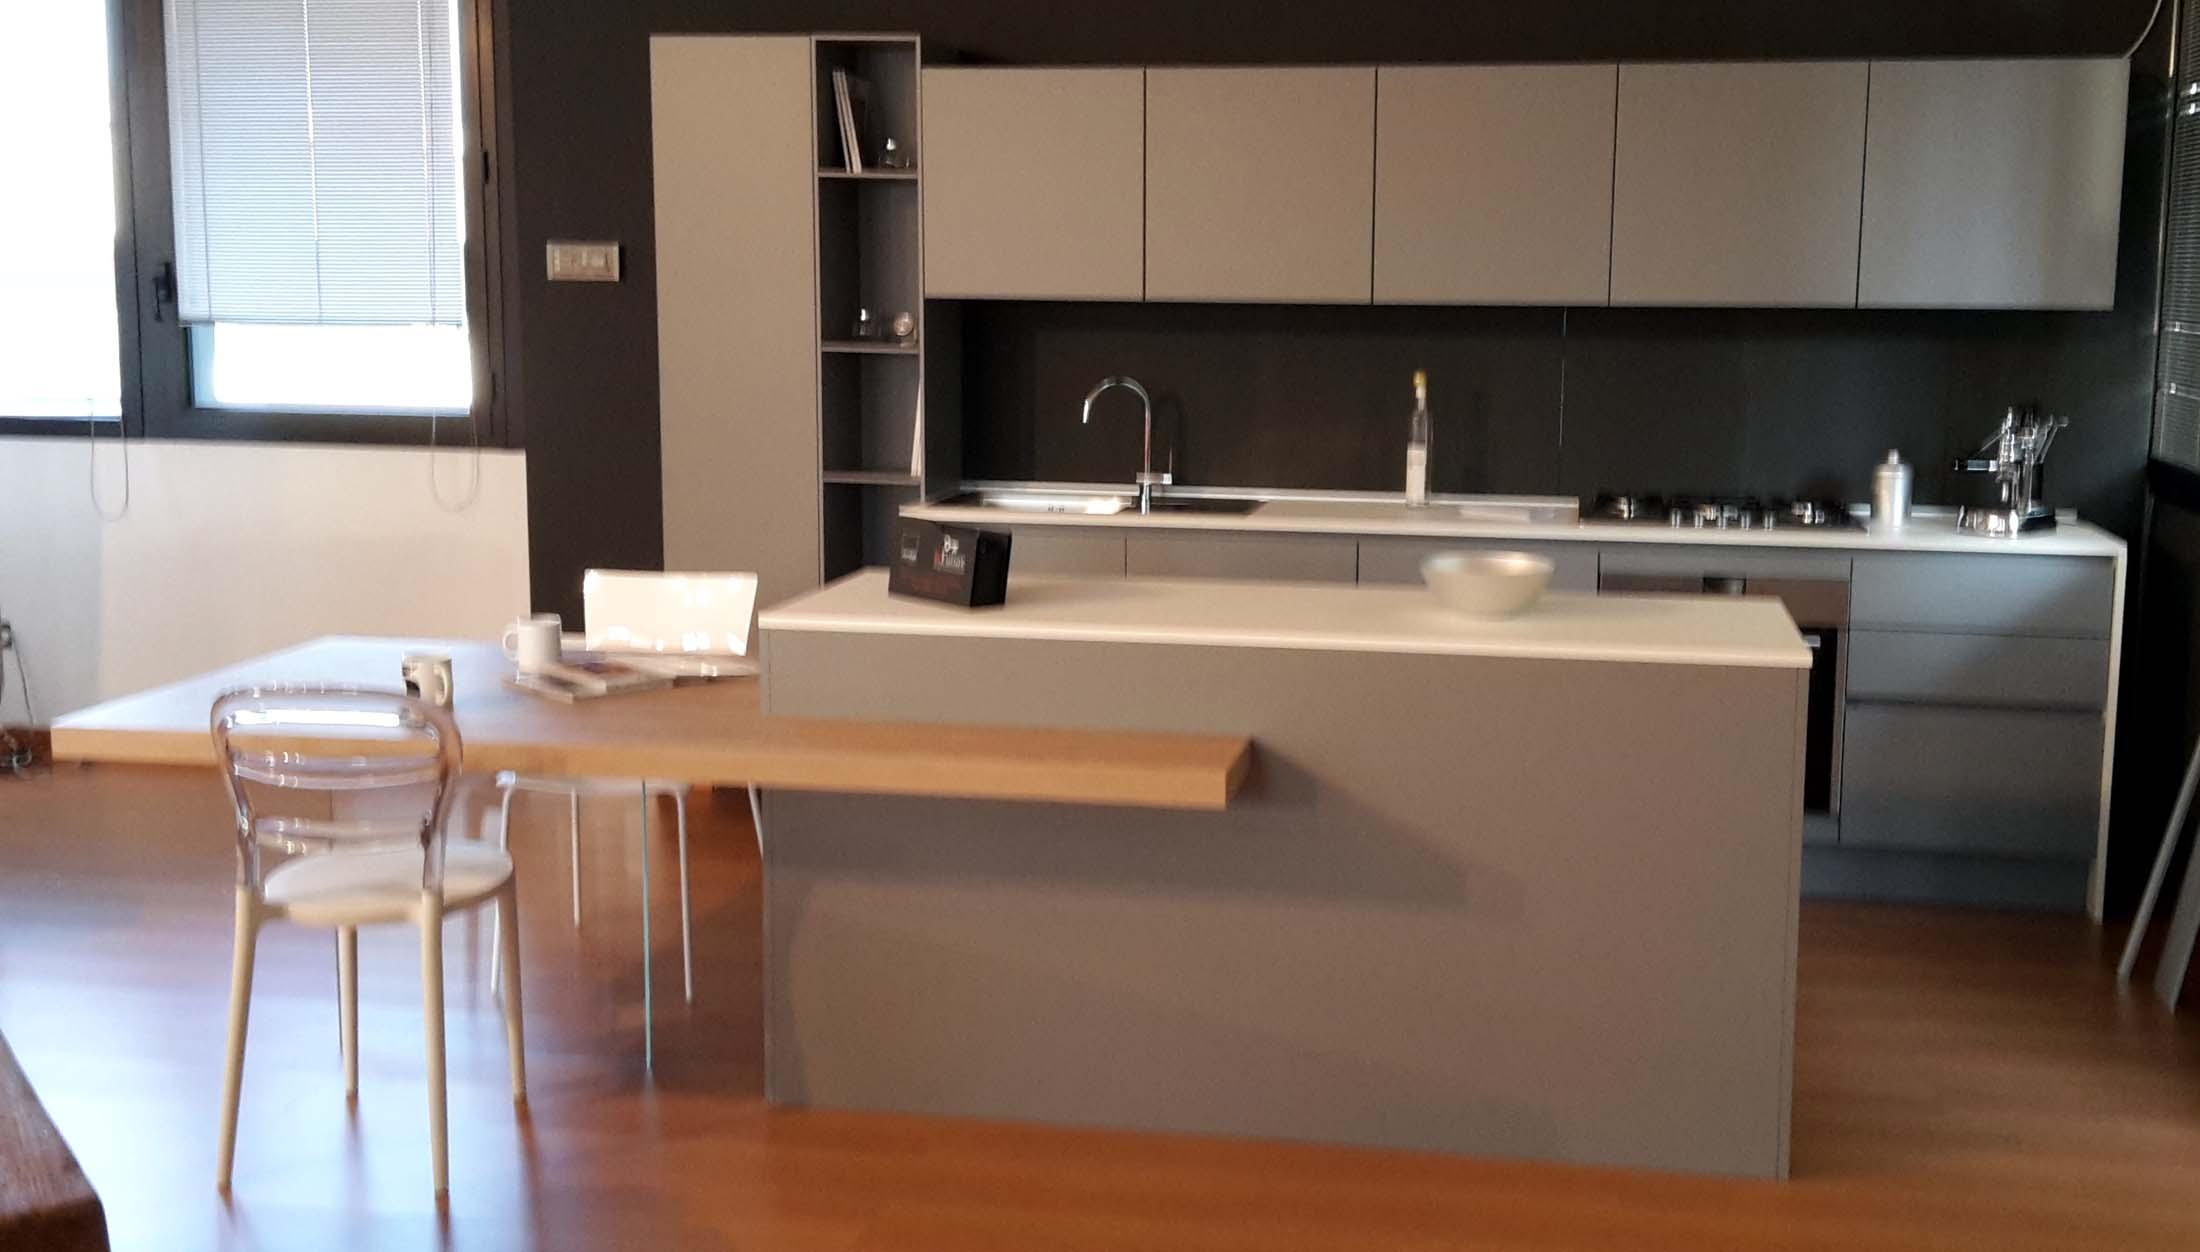 Arrital O Veneta Cucine | madgeweb.com idee di interior design